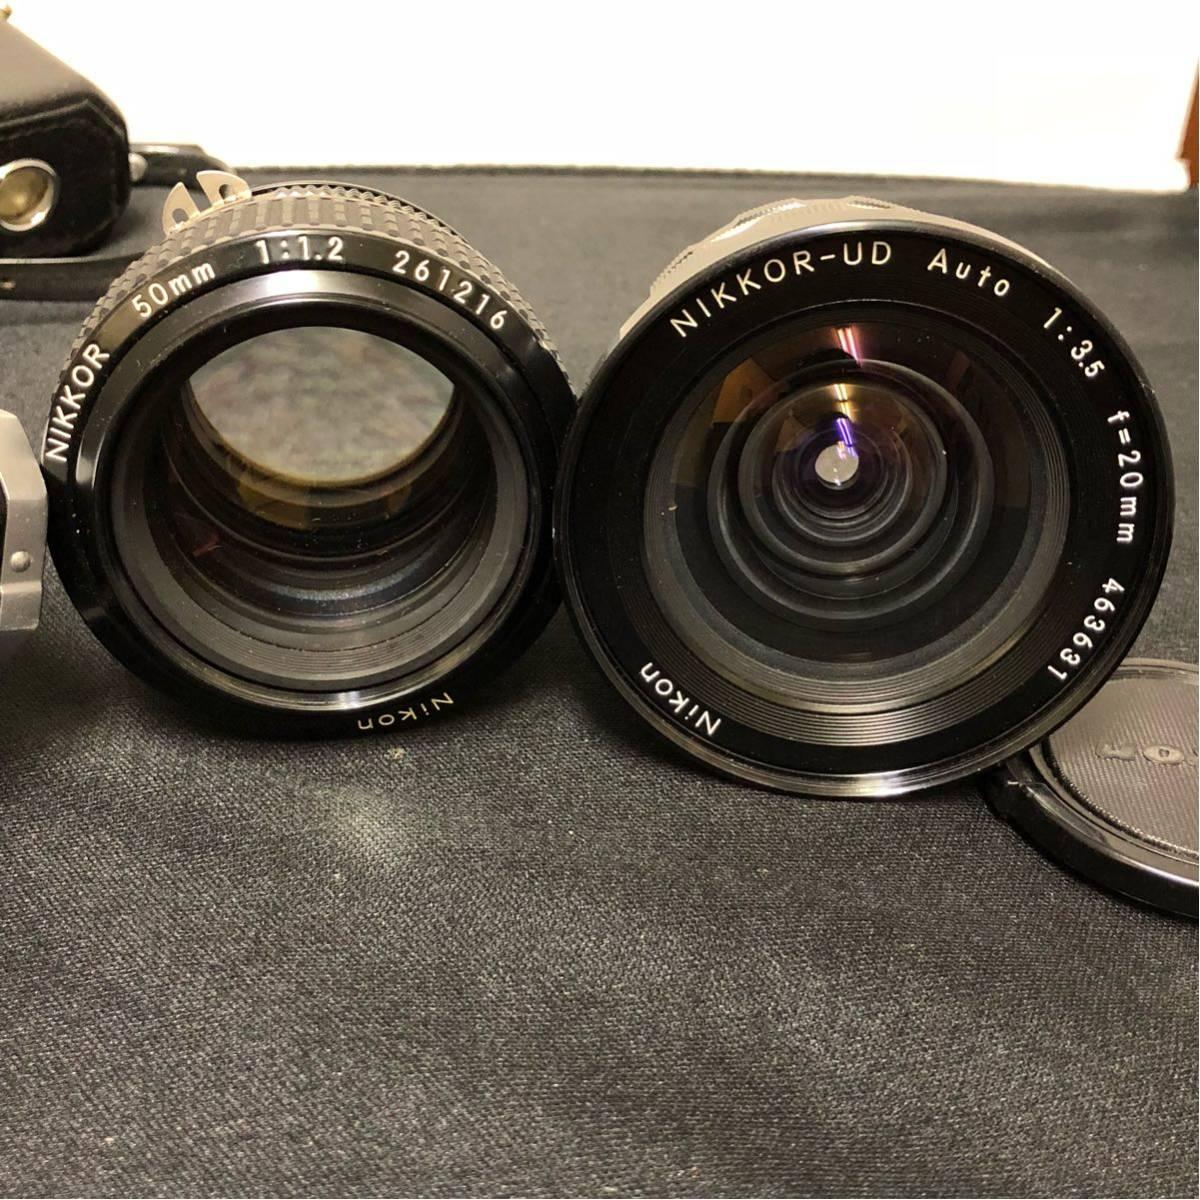 ♯ NIKON ニコン 一眼レフ カメラ F nikkor-ud 1:3.5 20mm nikkor 50mm 1:1.2 レンズ2本セット_画像7